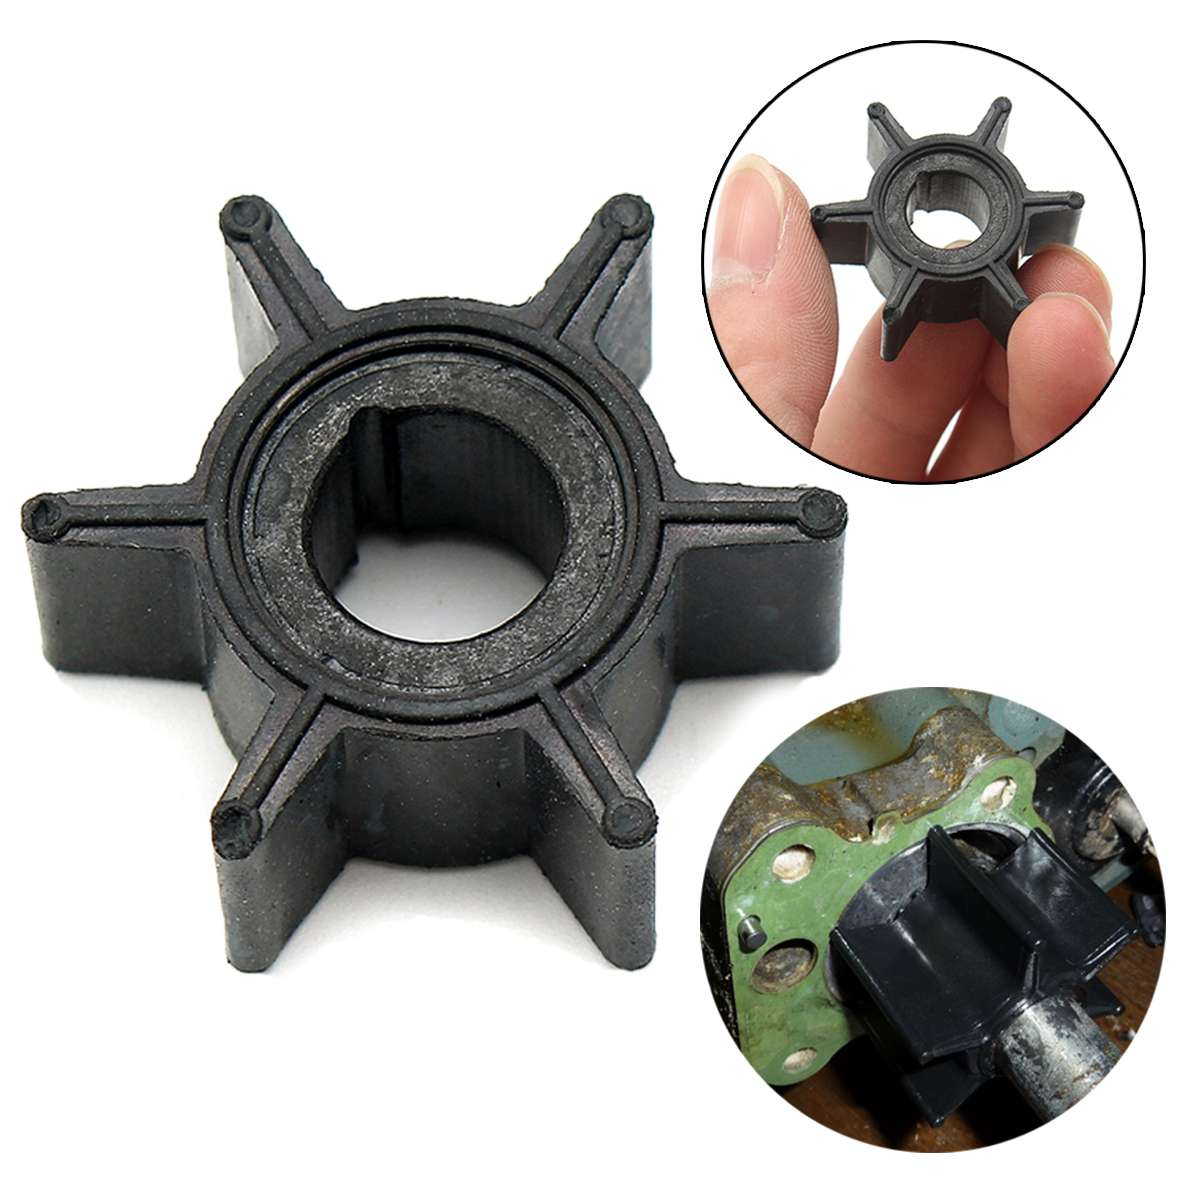 47-16154-3 Water Pump Impeller For Tohatsu/Mercury/Sierra 2/2.5/3.5/4/5/6HP Outboard Motor Rubber Diameter 3.4cm 6 Blades Black